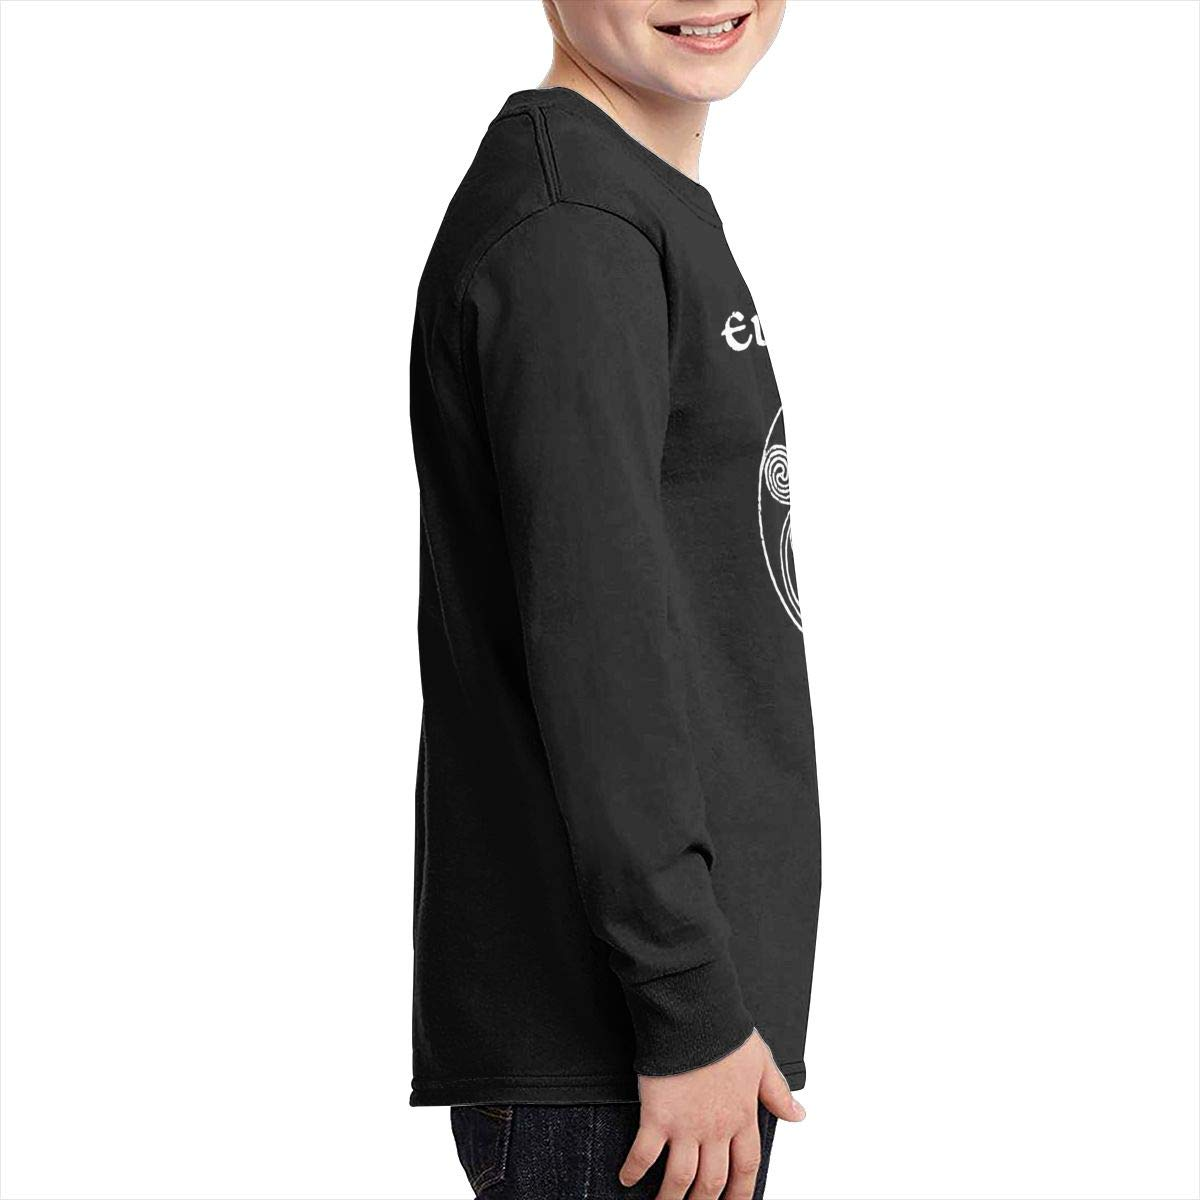 HangHisi Eluveitie Boys /& Girls O Neck Regular Style Tee Long Sleeve T Shirt Leisure